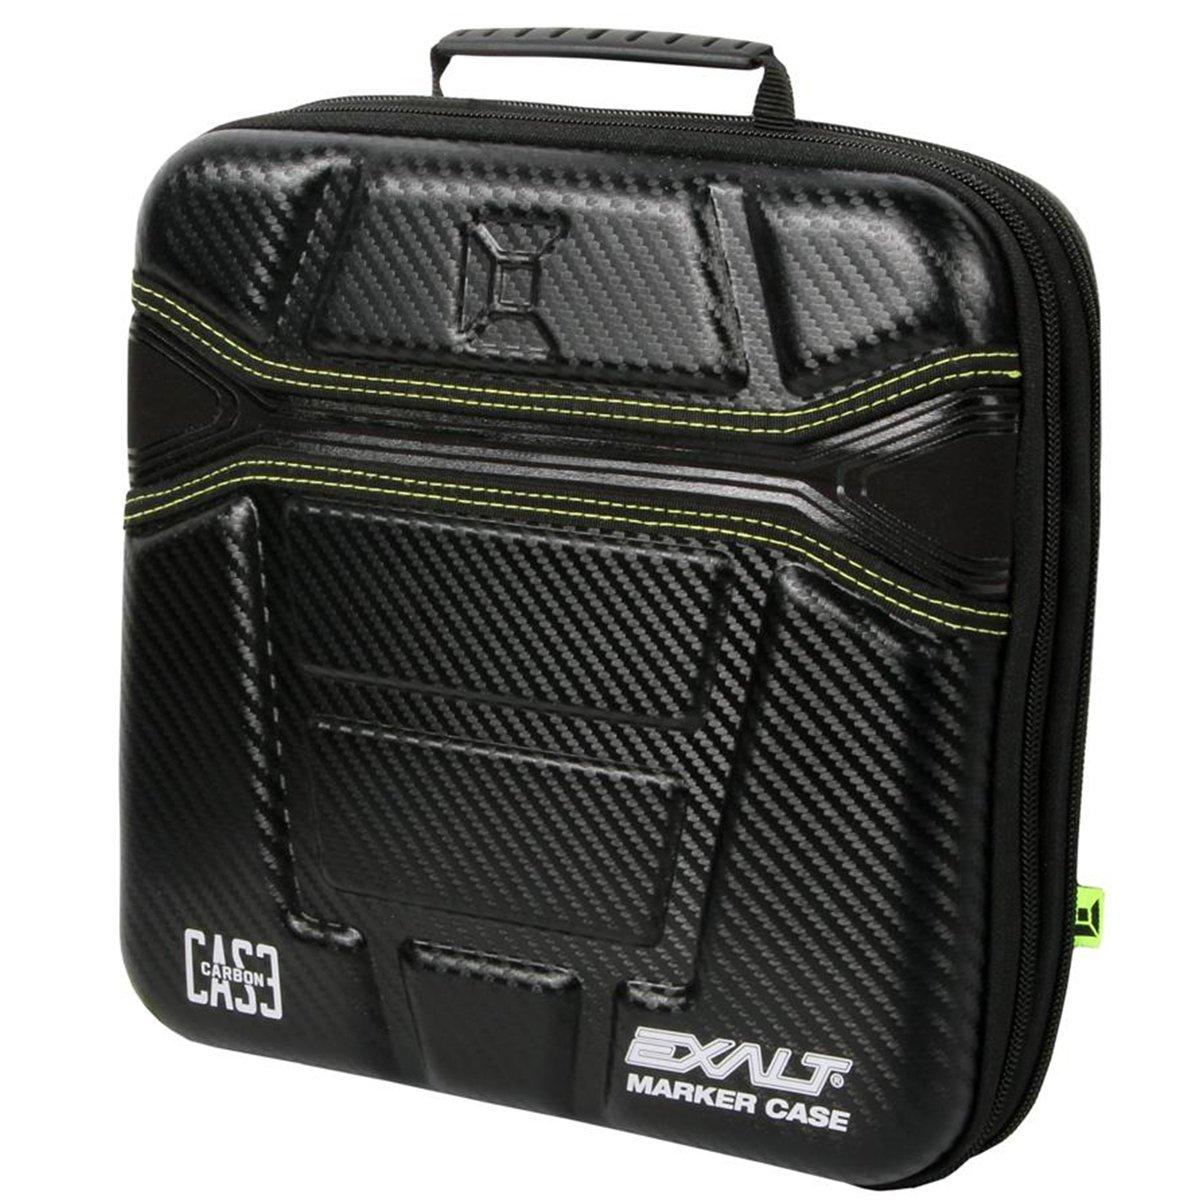 Exalt Paintball Carbon Series Marker Case / Gun Bag - Black / Lime